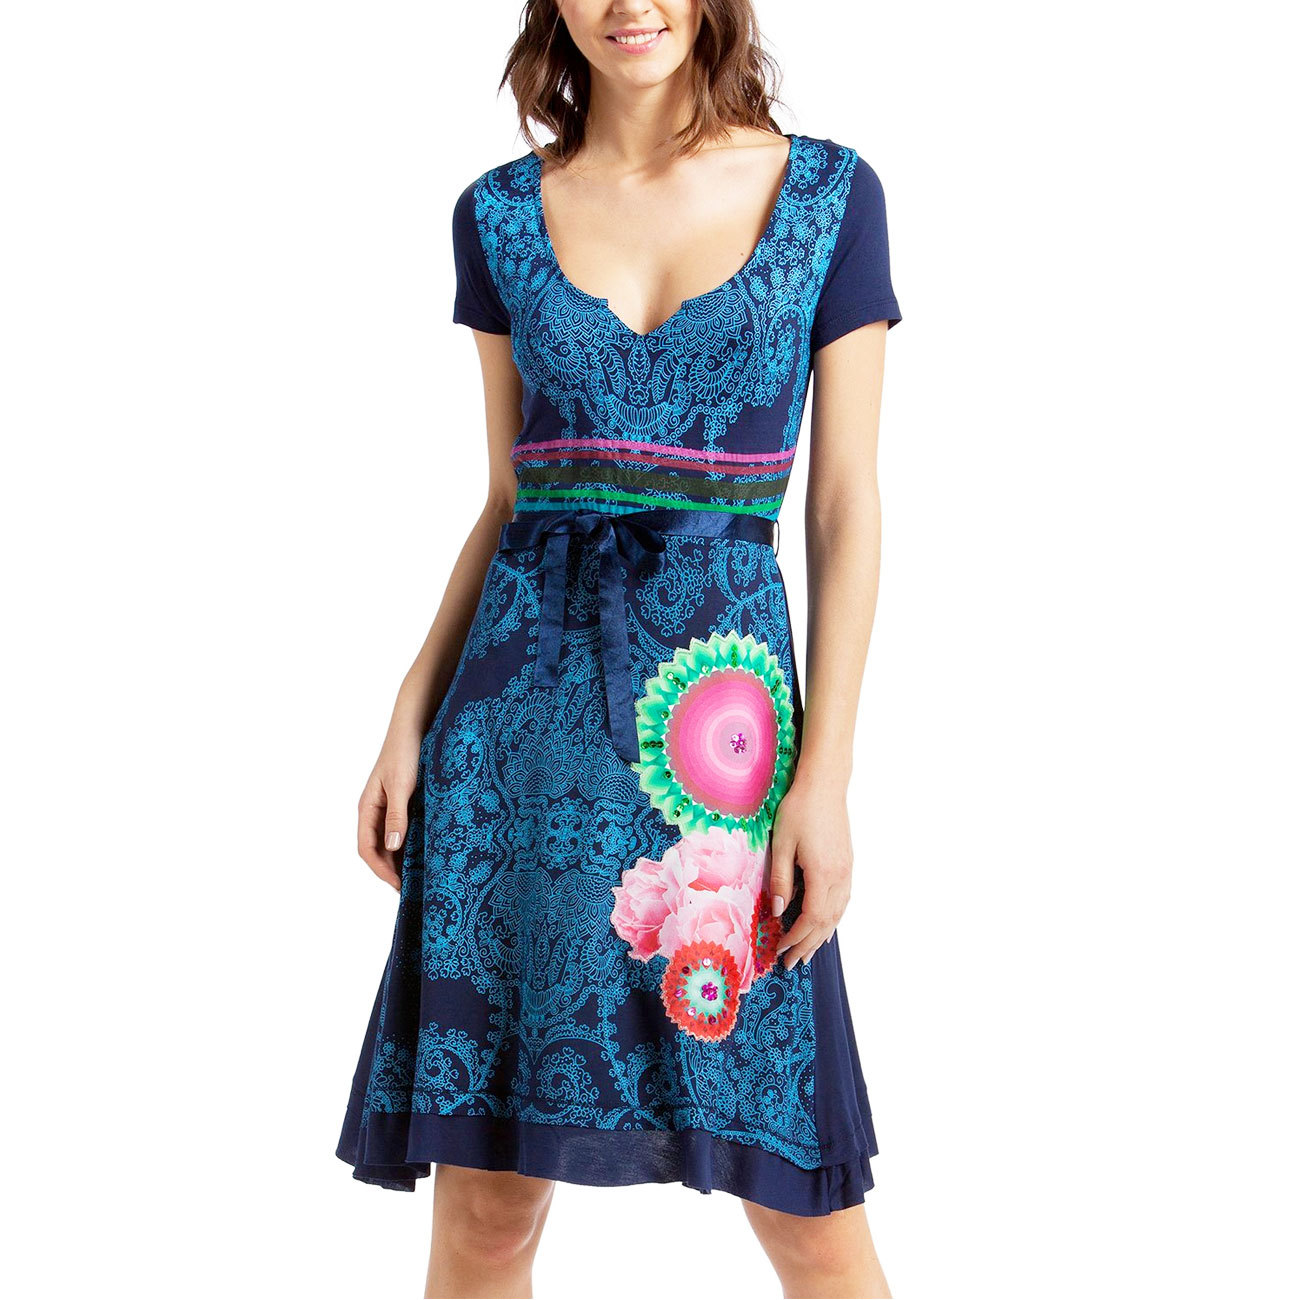 desigual damen kleid vest lorena rep blau marino 5001 42 herstellergr e xxl. Black Bedroom Furniture Sets. Home Design Ideas